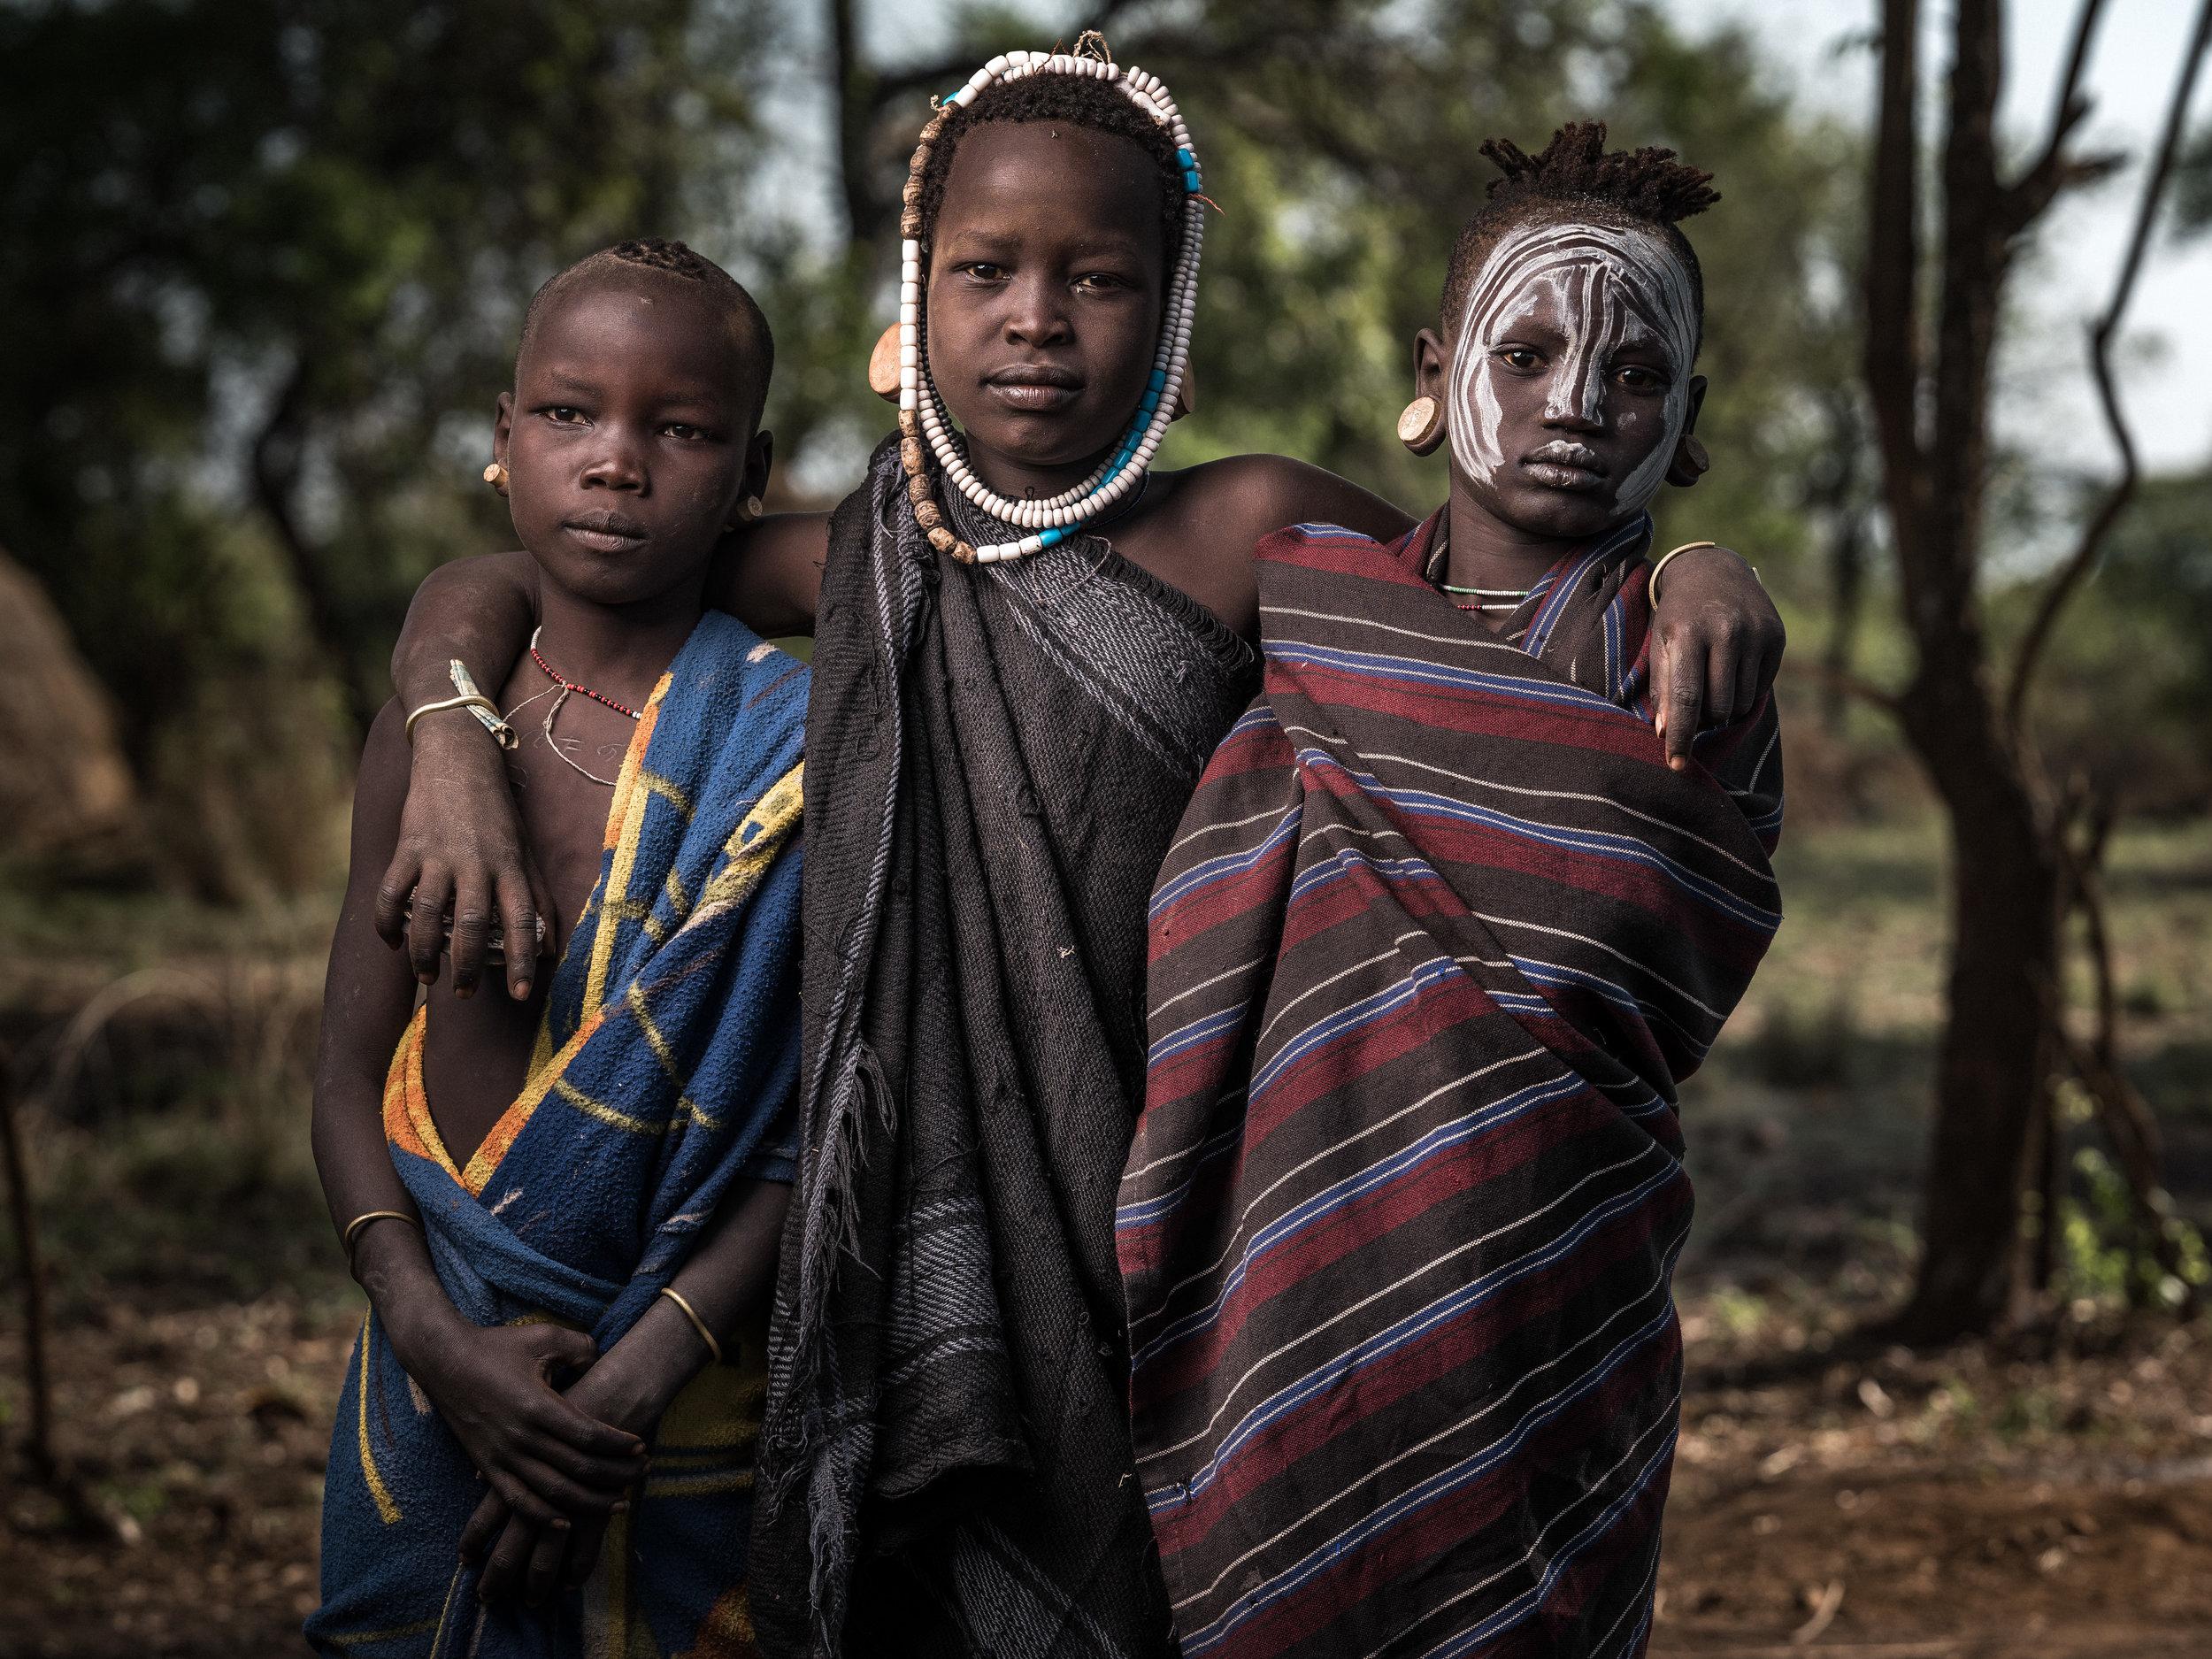 Ethiopia-Starling-PietVandenEynde_027.jpg